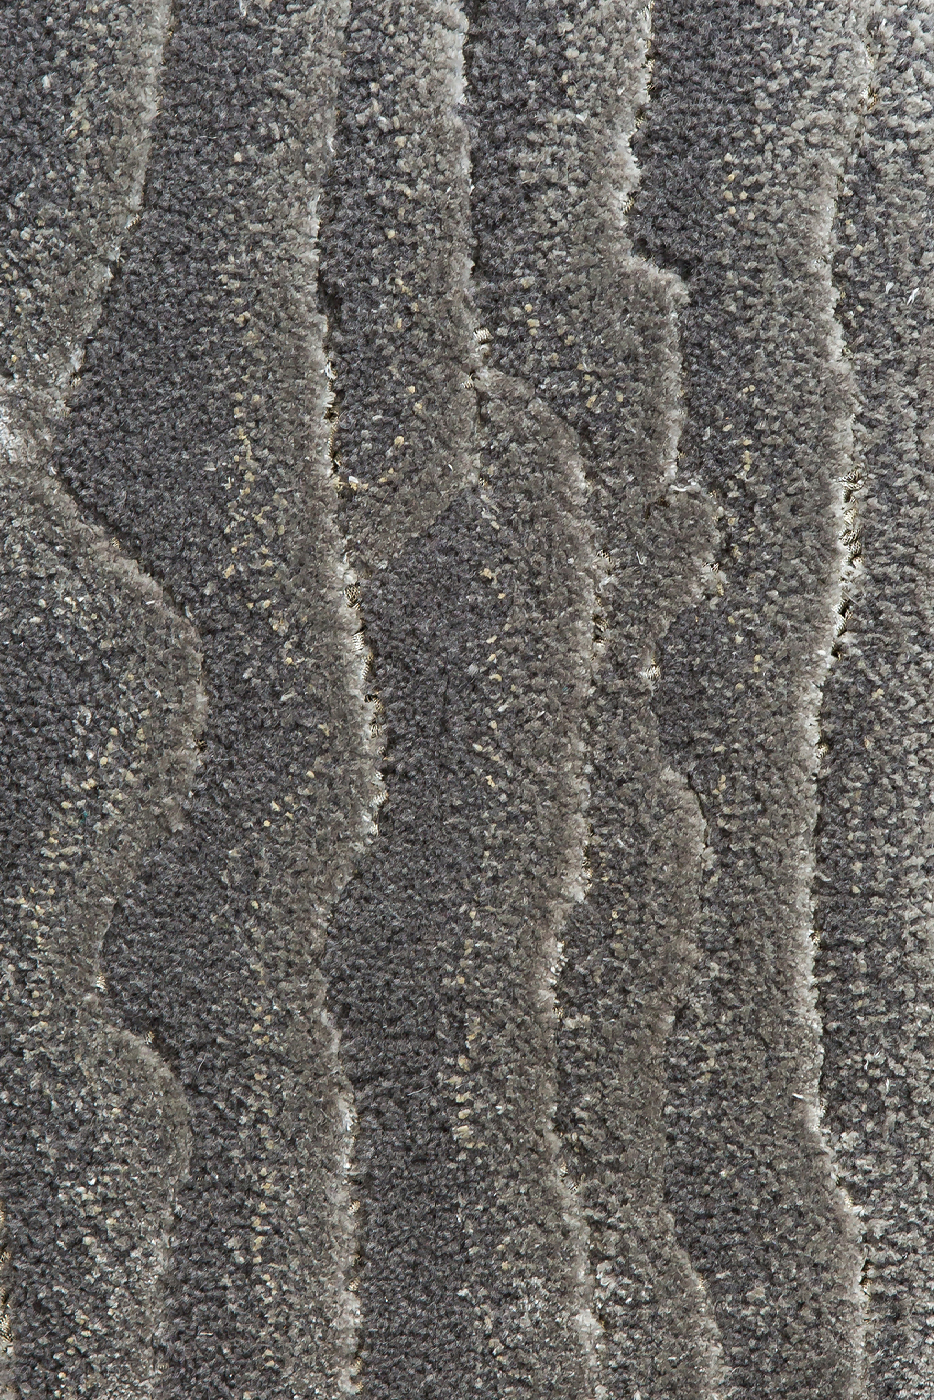 Yachting & aviation - Dunes by Ulrika Liljedahl